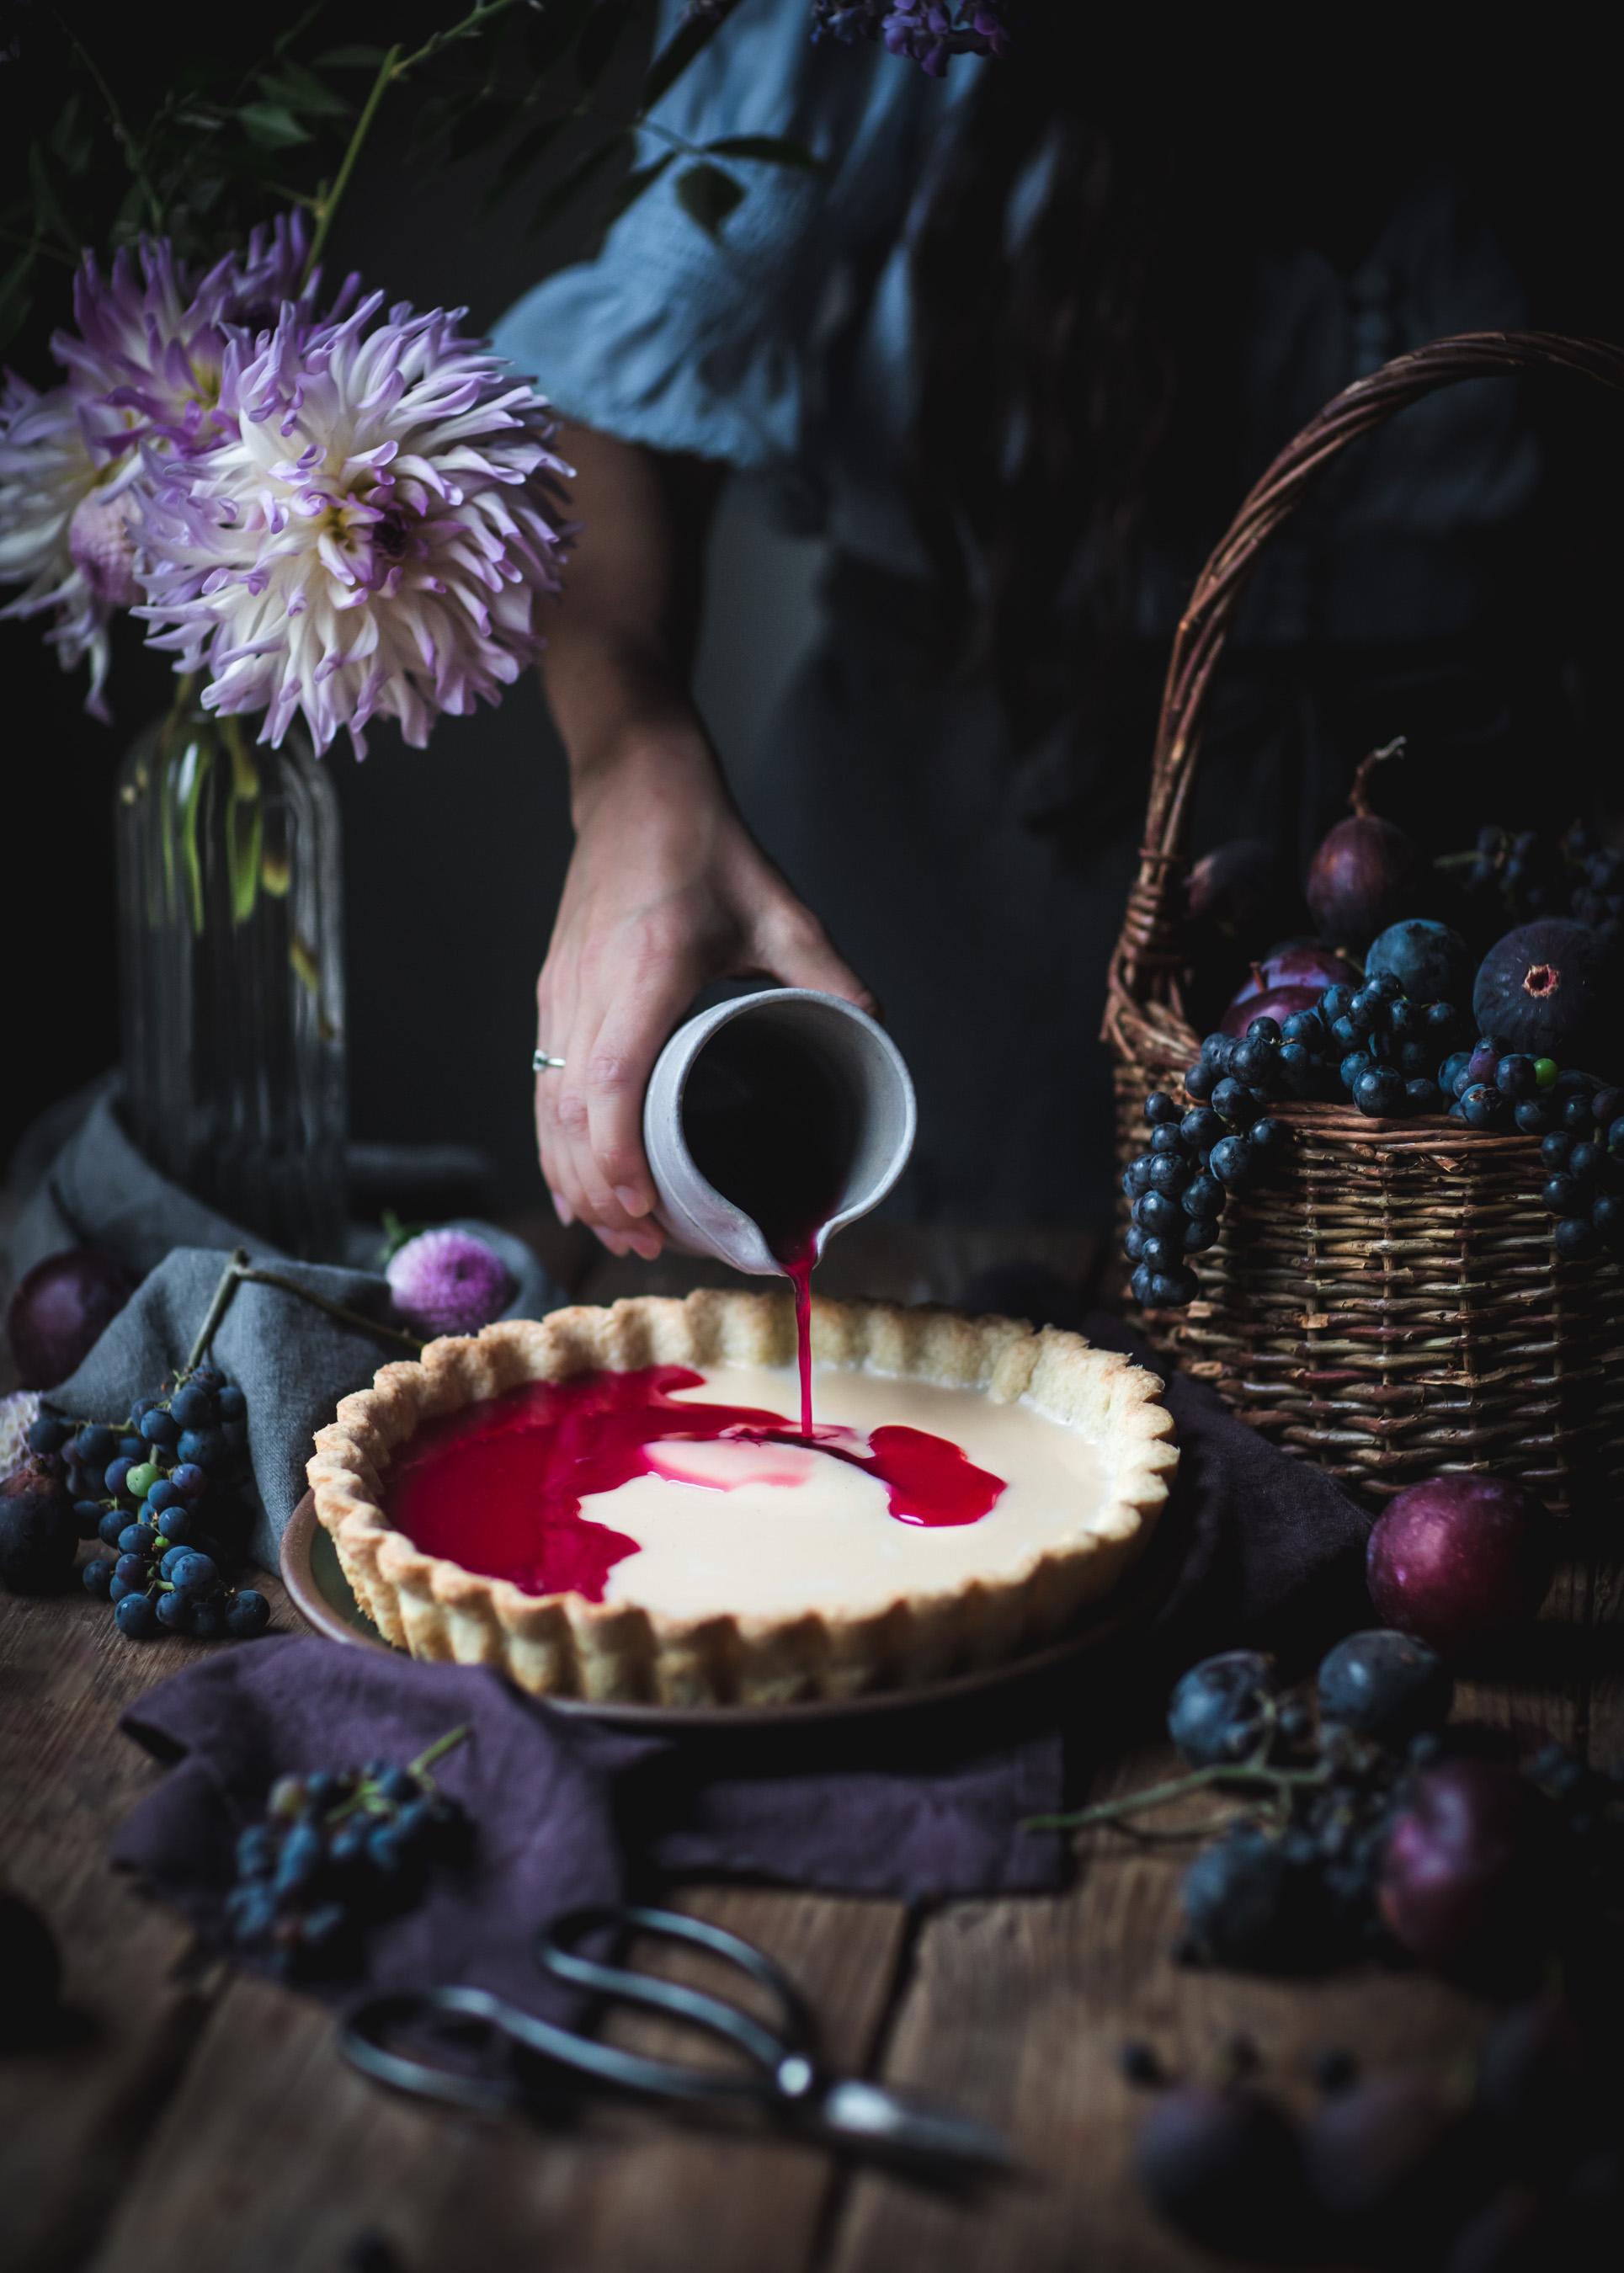 Grape Custard Tart with Fresh Fruit